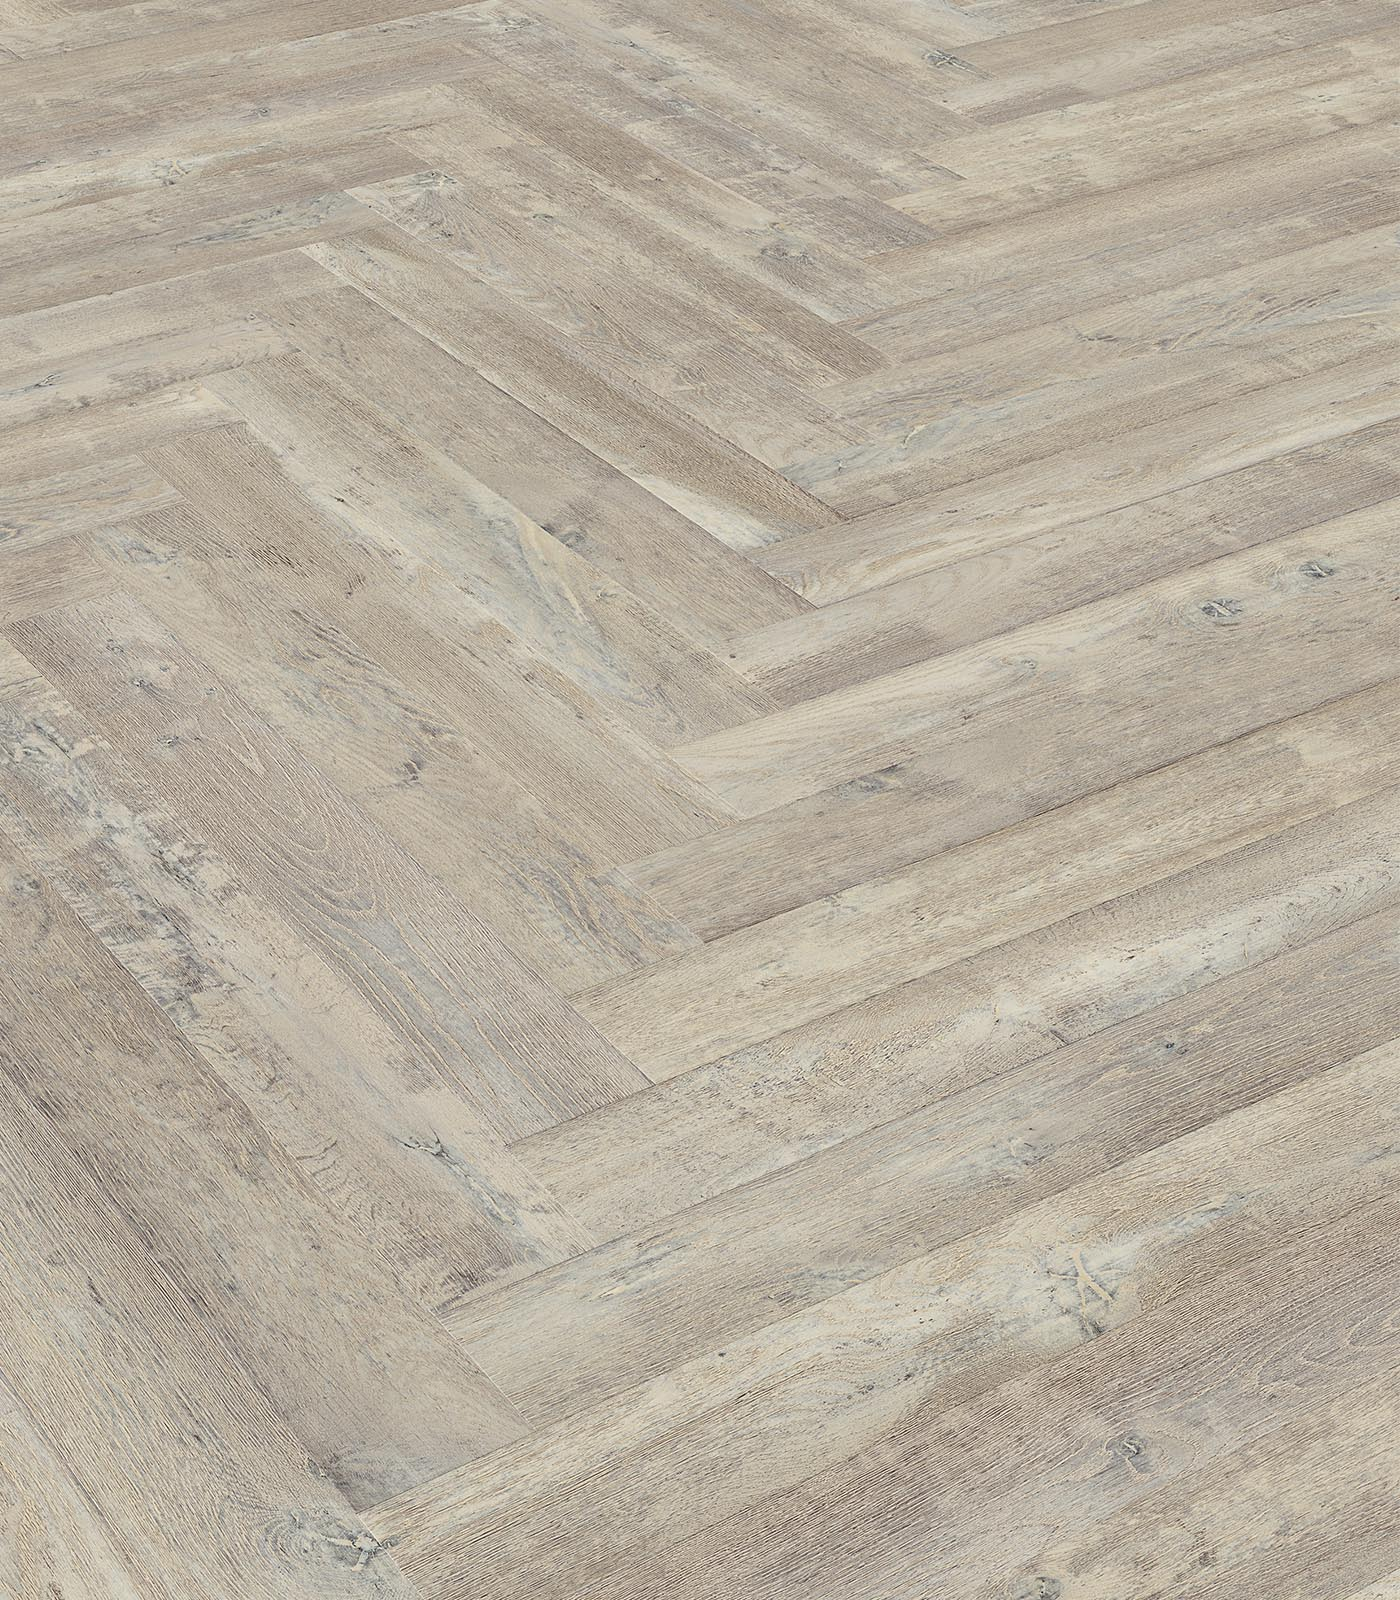 Western European oak flooring-Fashion Collection-Herringbone-Vail-angle